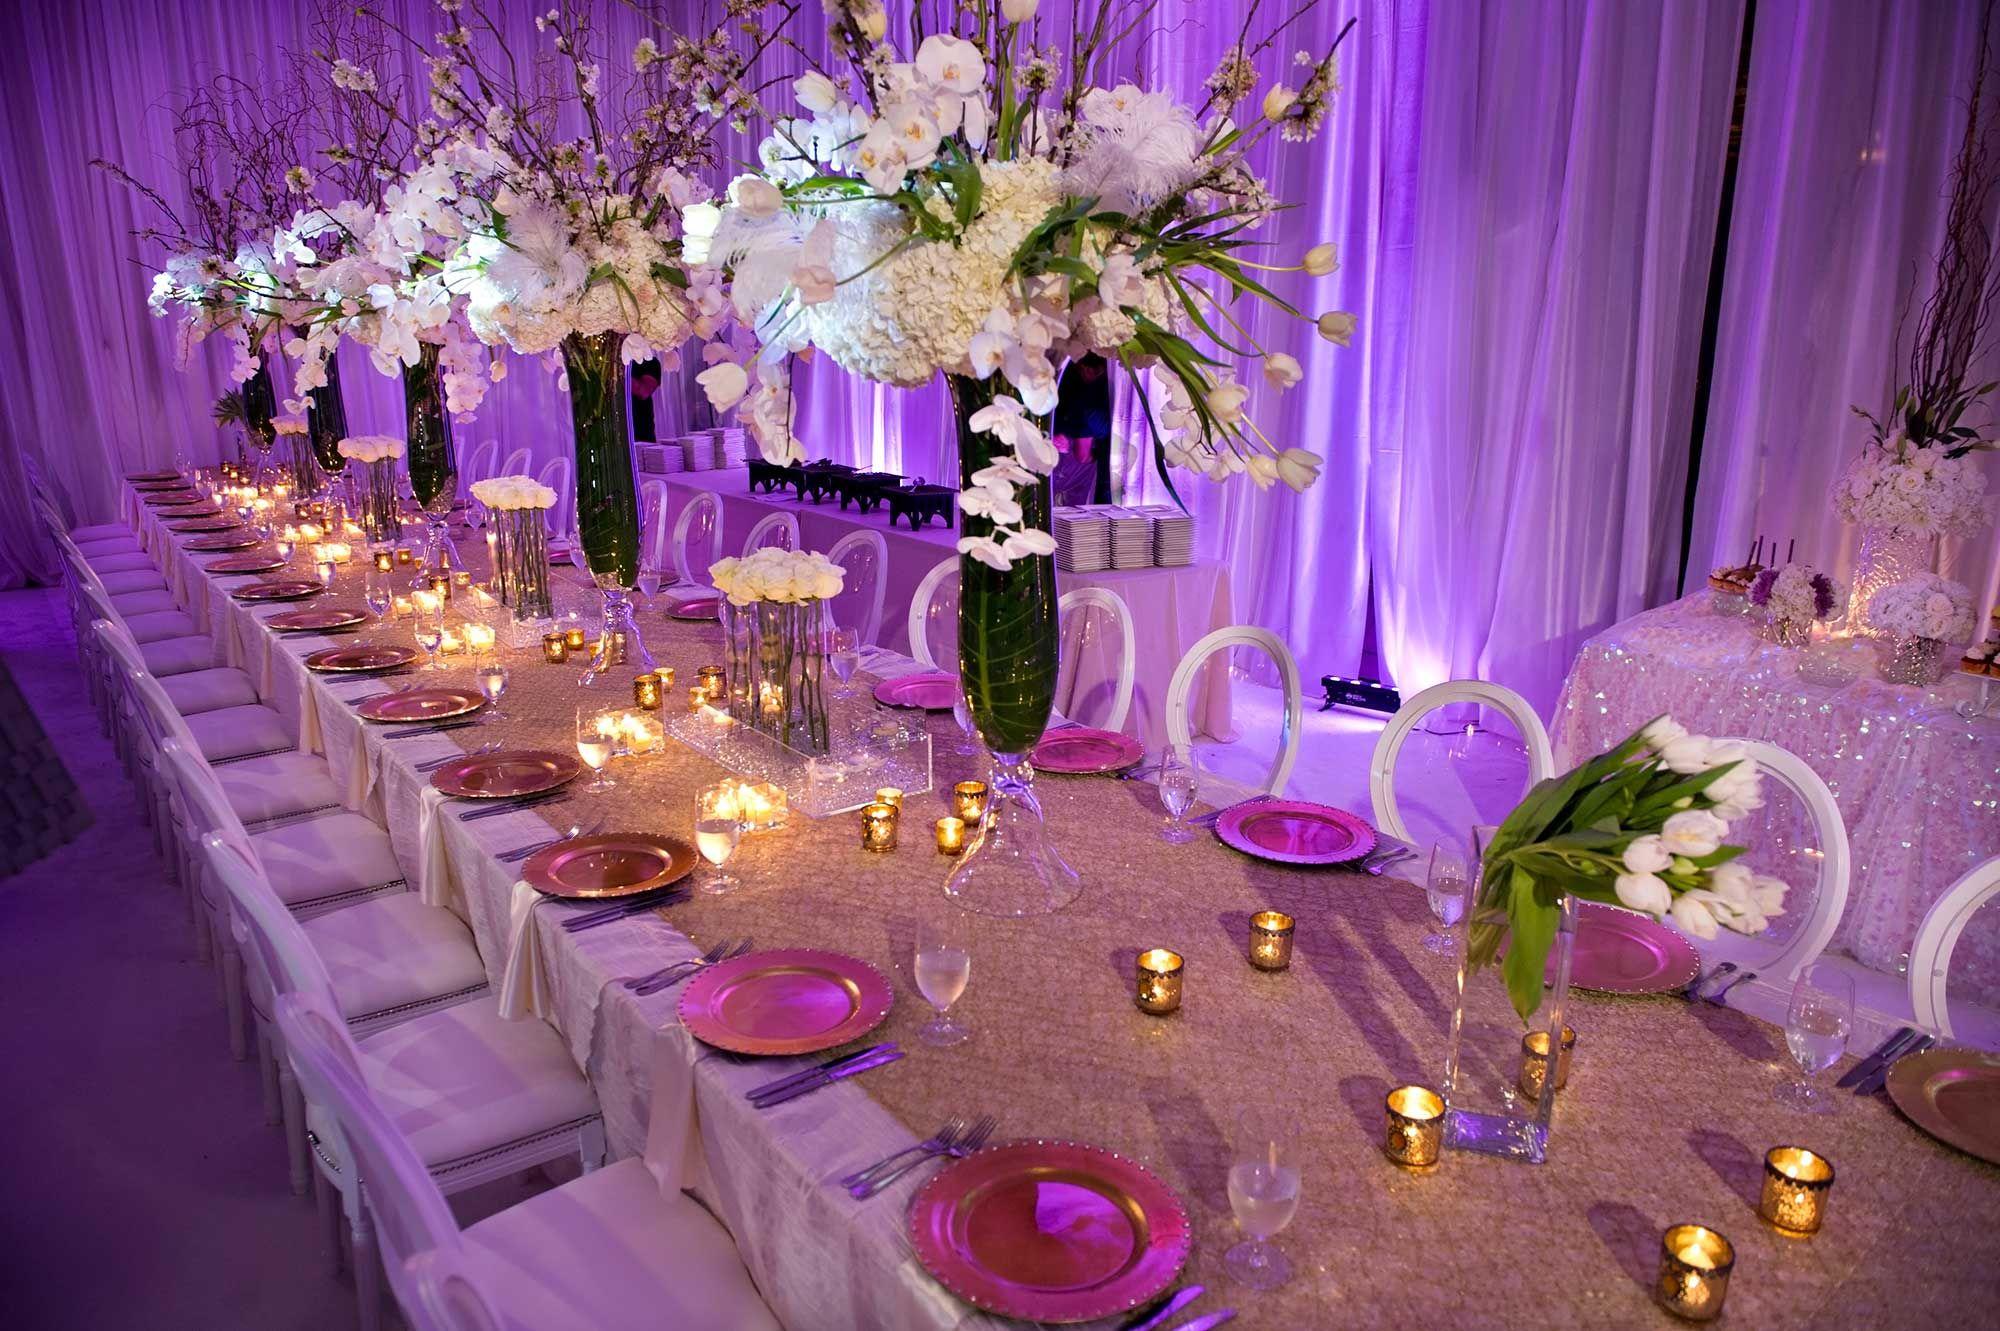 pinterest wedding table decorations candles%0A http   www utopianevent com     Indian WeddingsTable SettingsAtlantaCandles